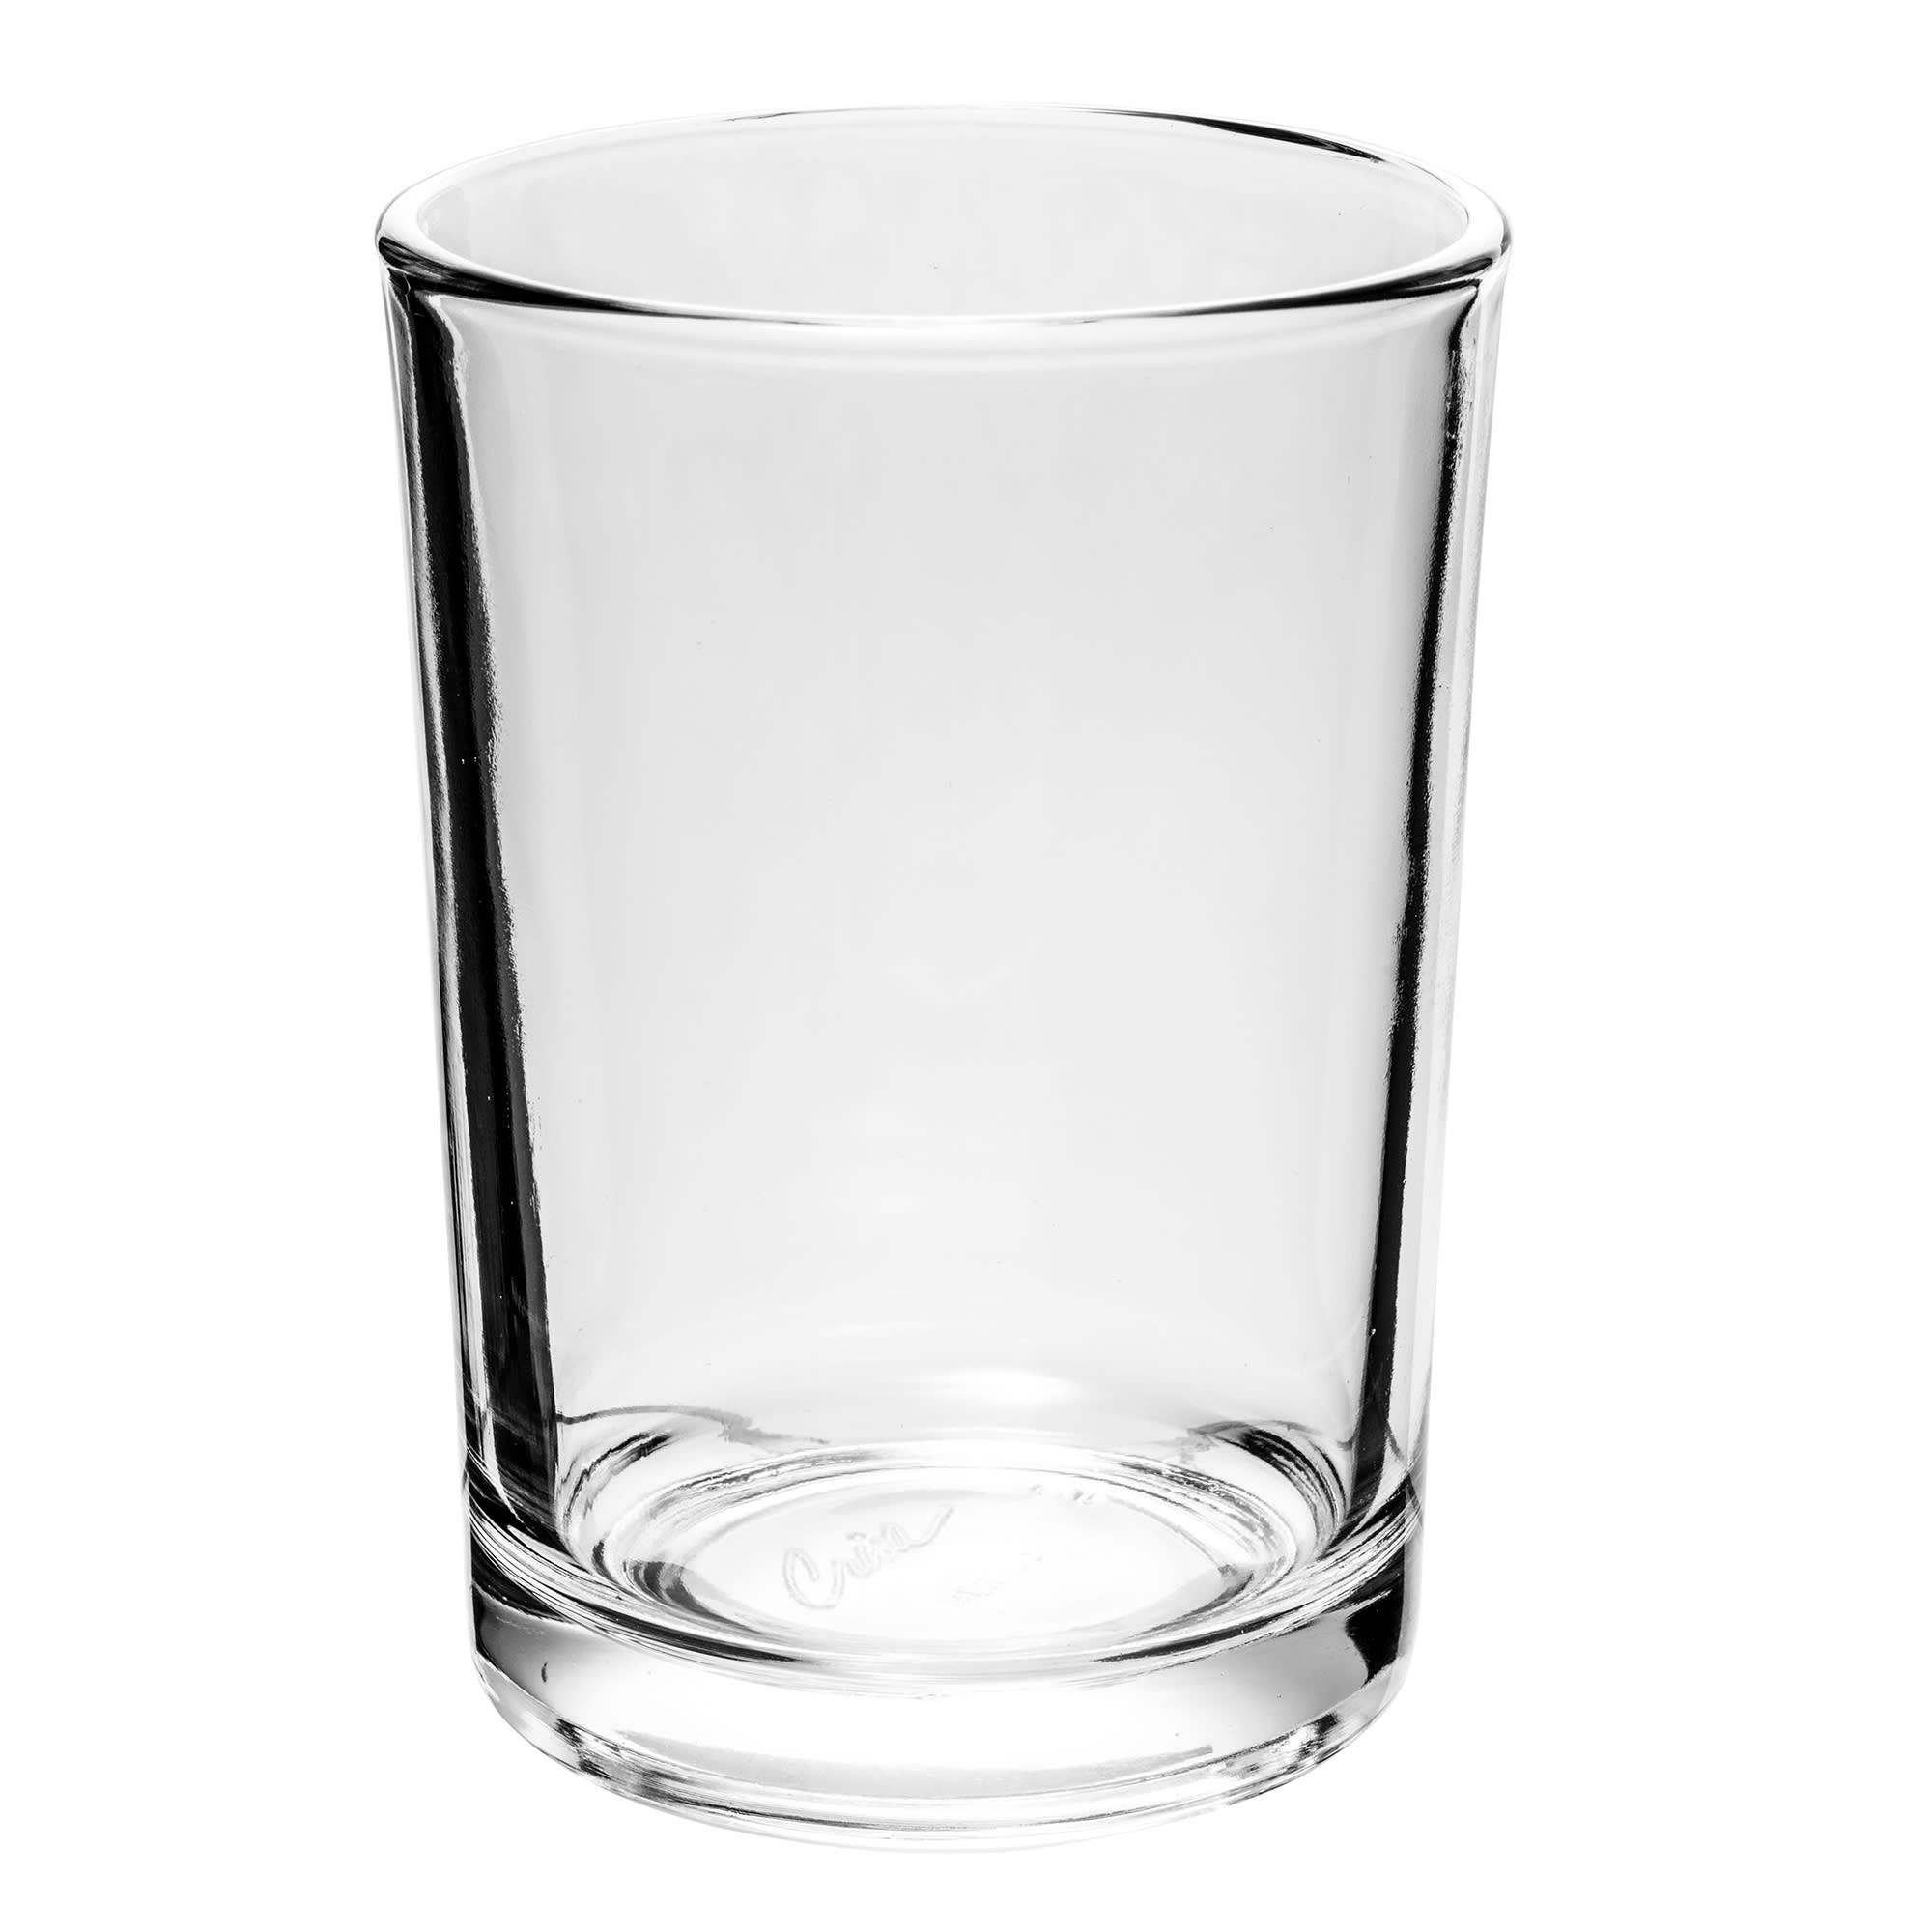 Libbey 1789821 9 oz Puebla Glass Tumbler